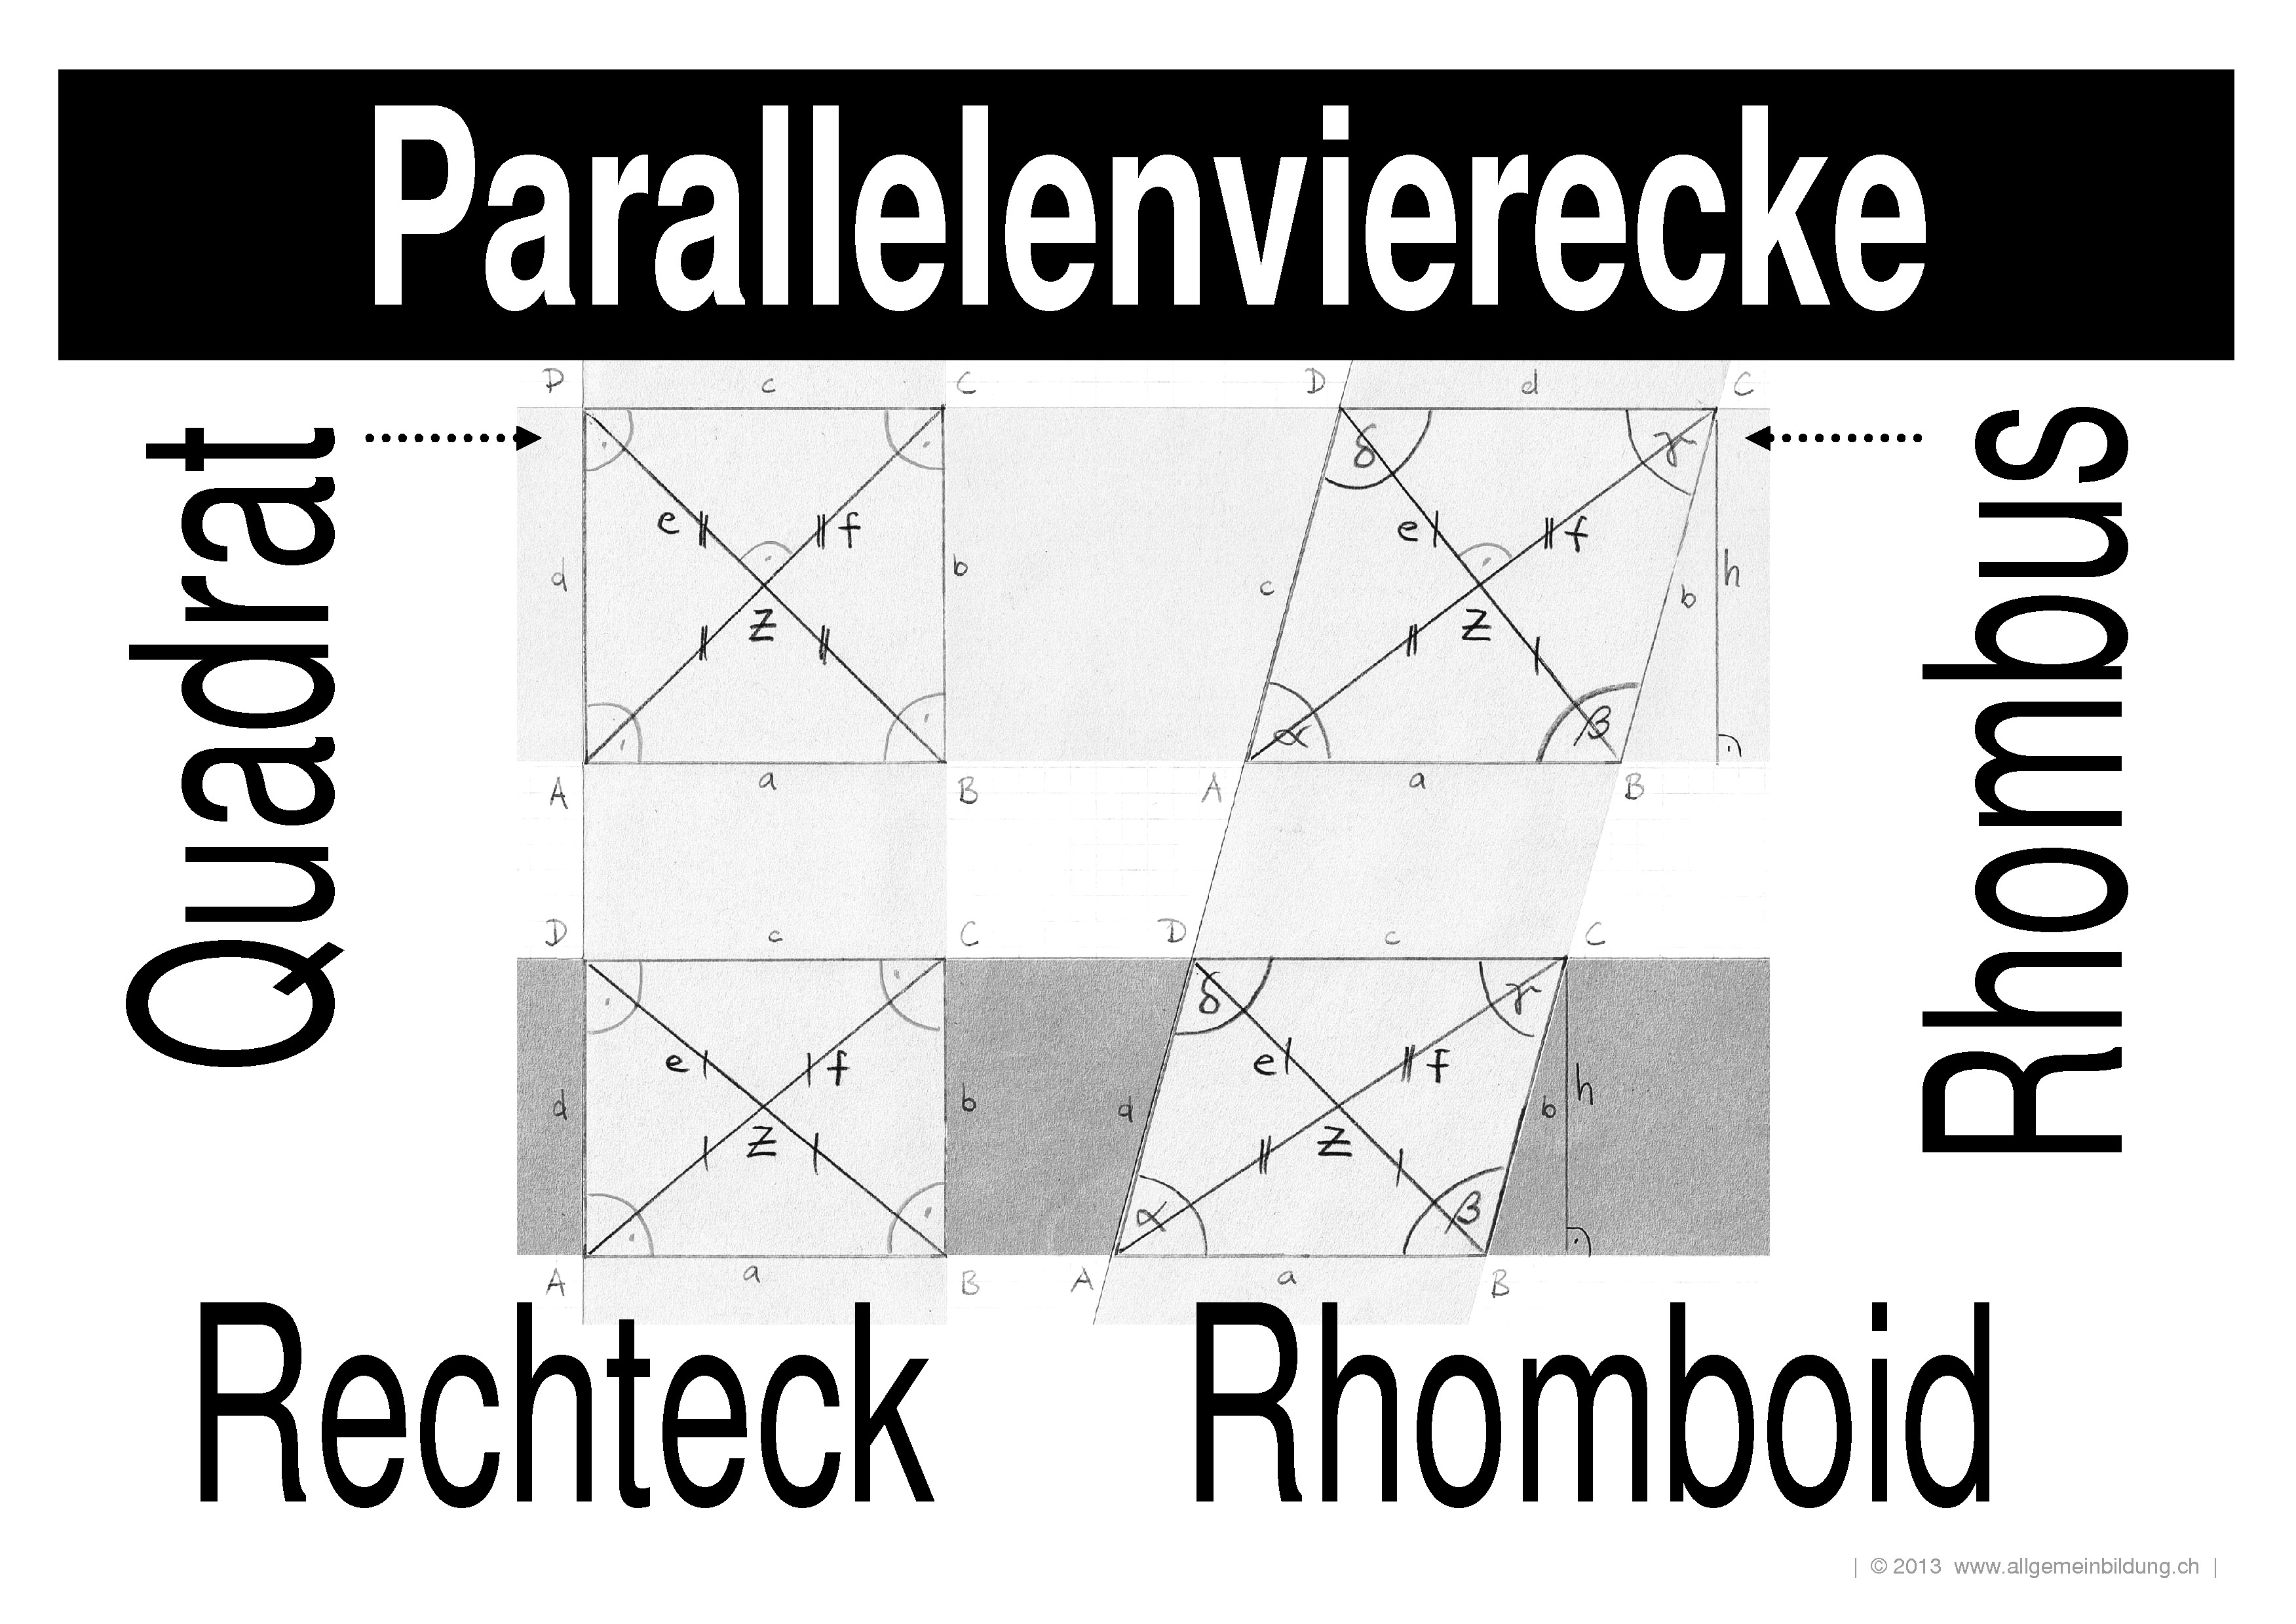 mathematik geometrie lernplakate wissensposter parallelenvierecke 8500 bungen. Black Bedroom Furniture Sets. Home Design Ideas